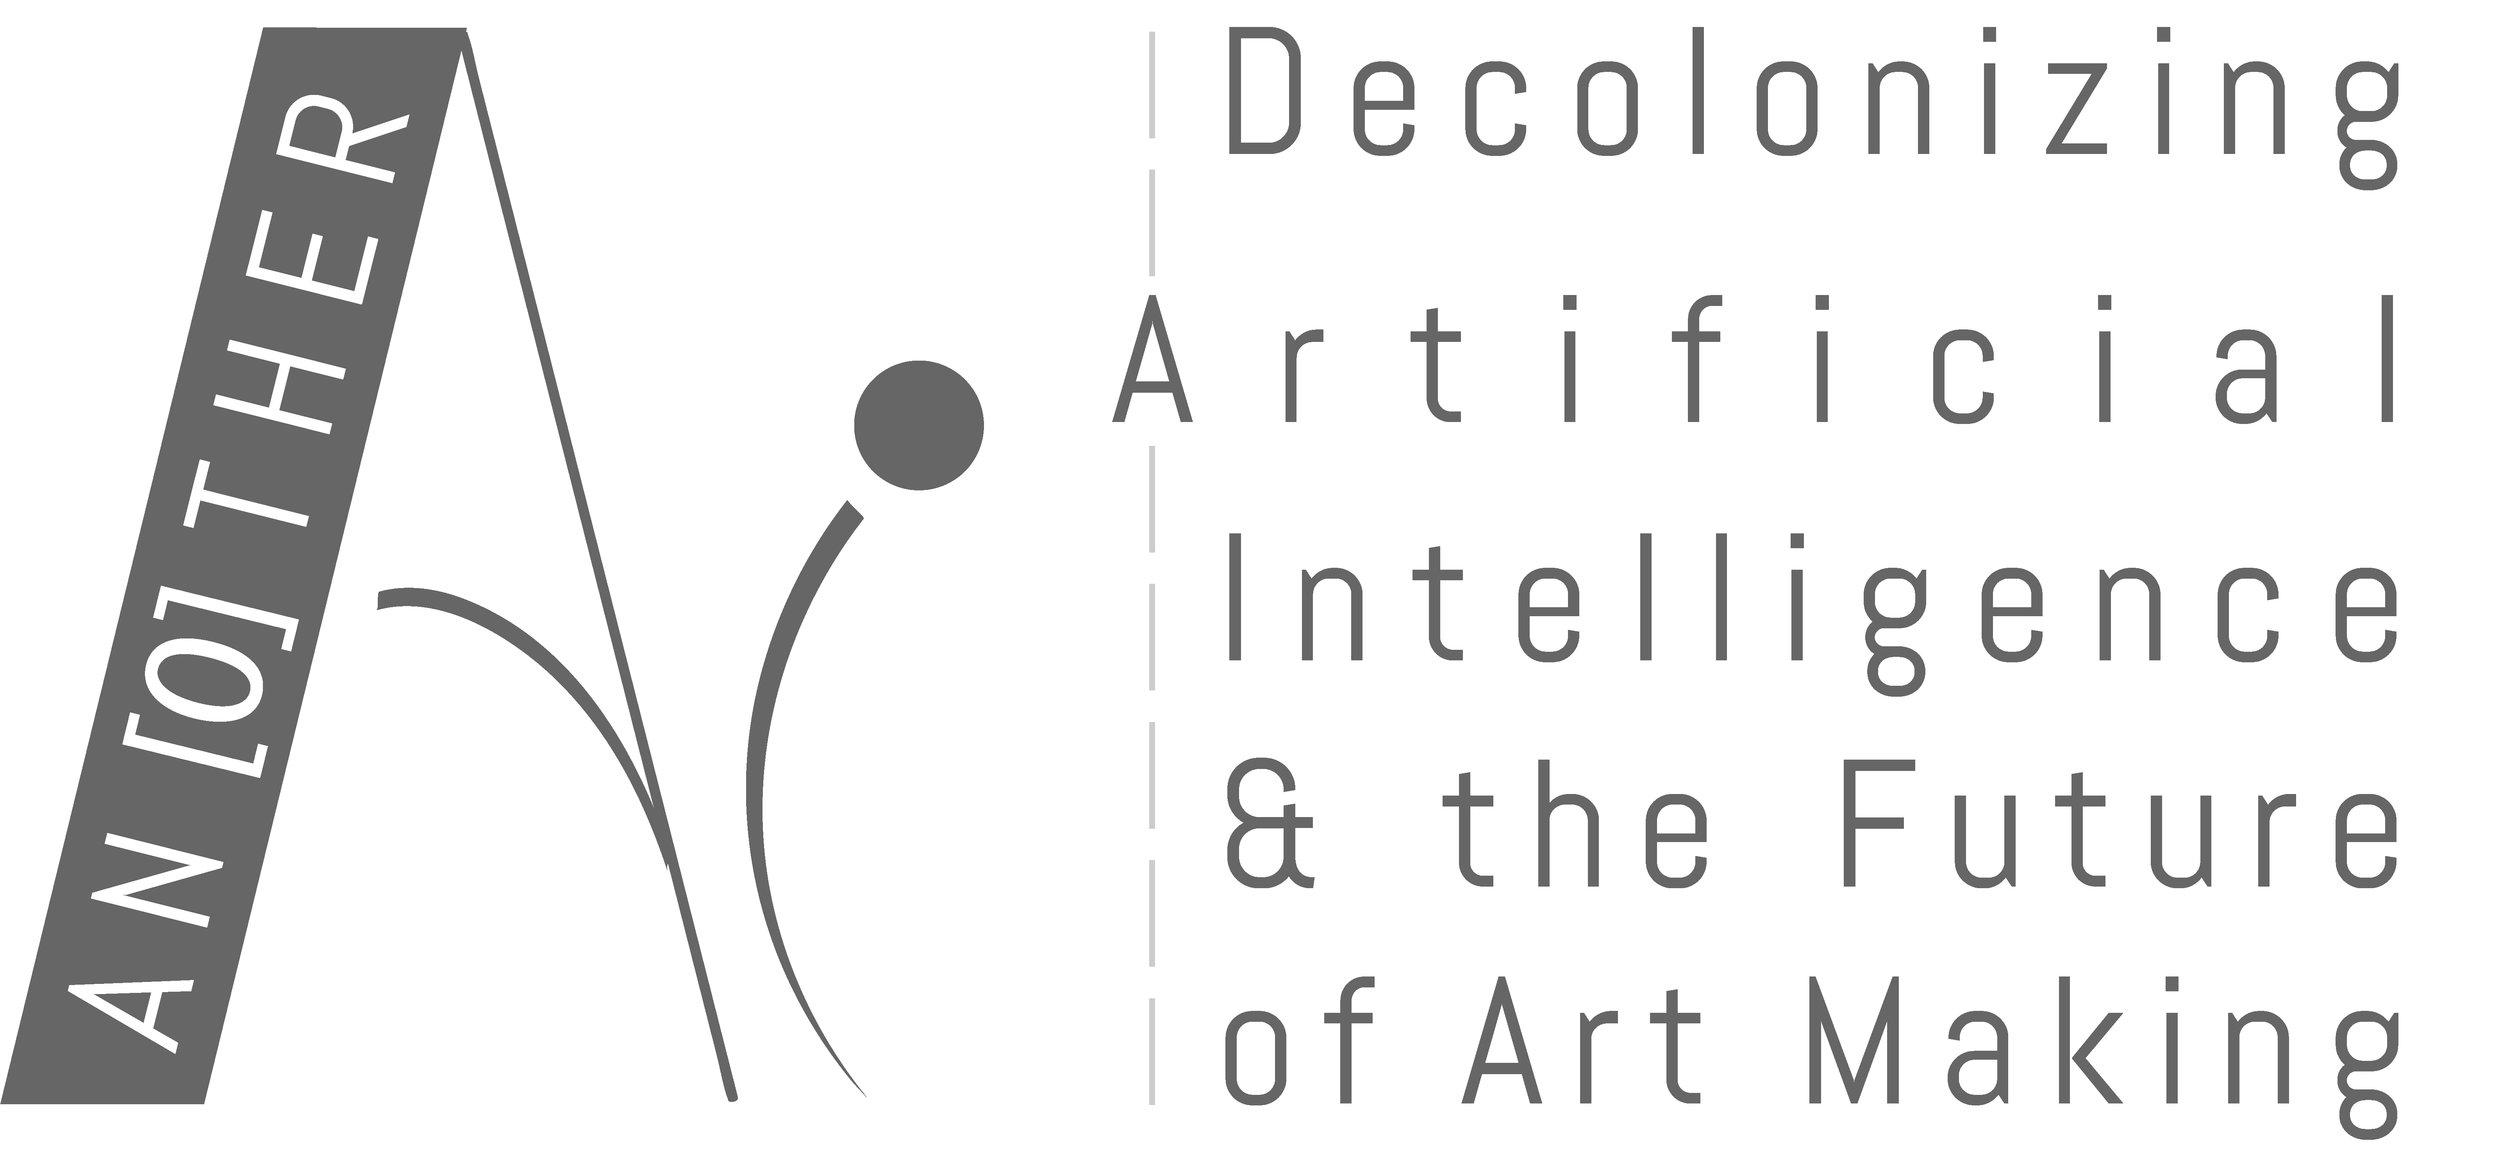 AnotherAI in Art_Logo 04_16_SM.jpg